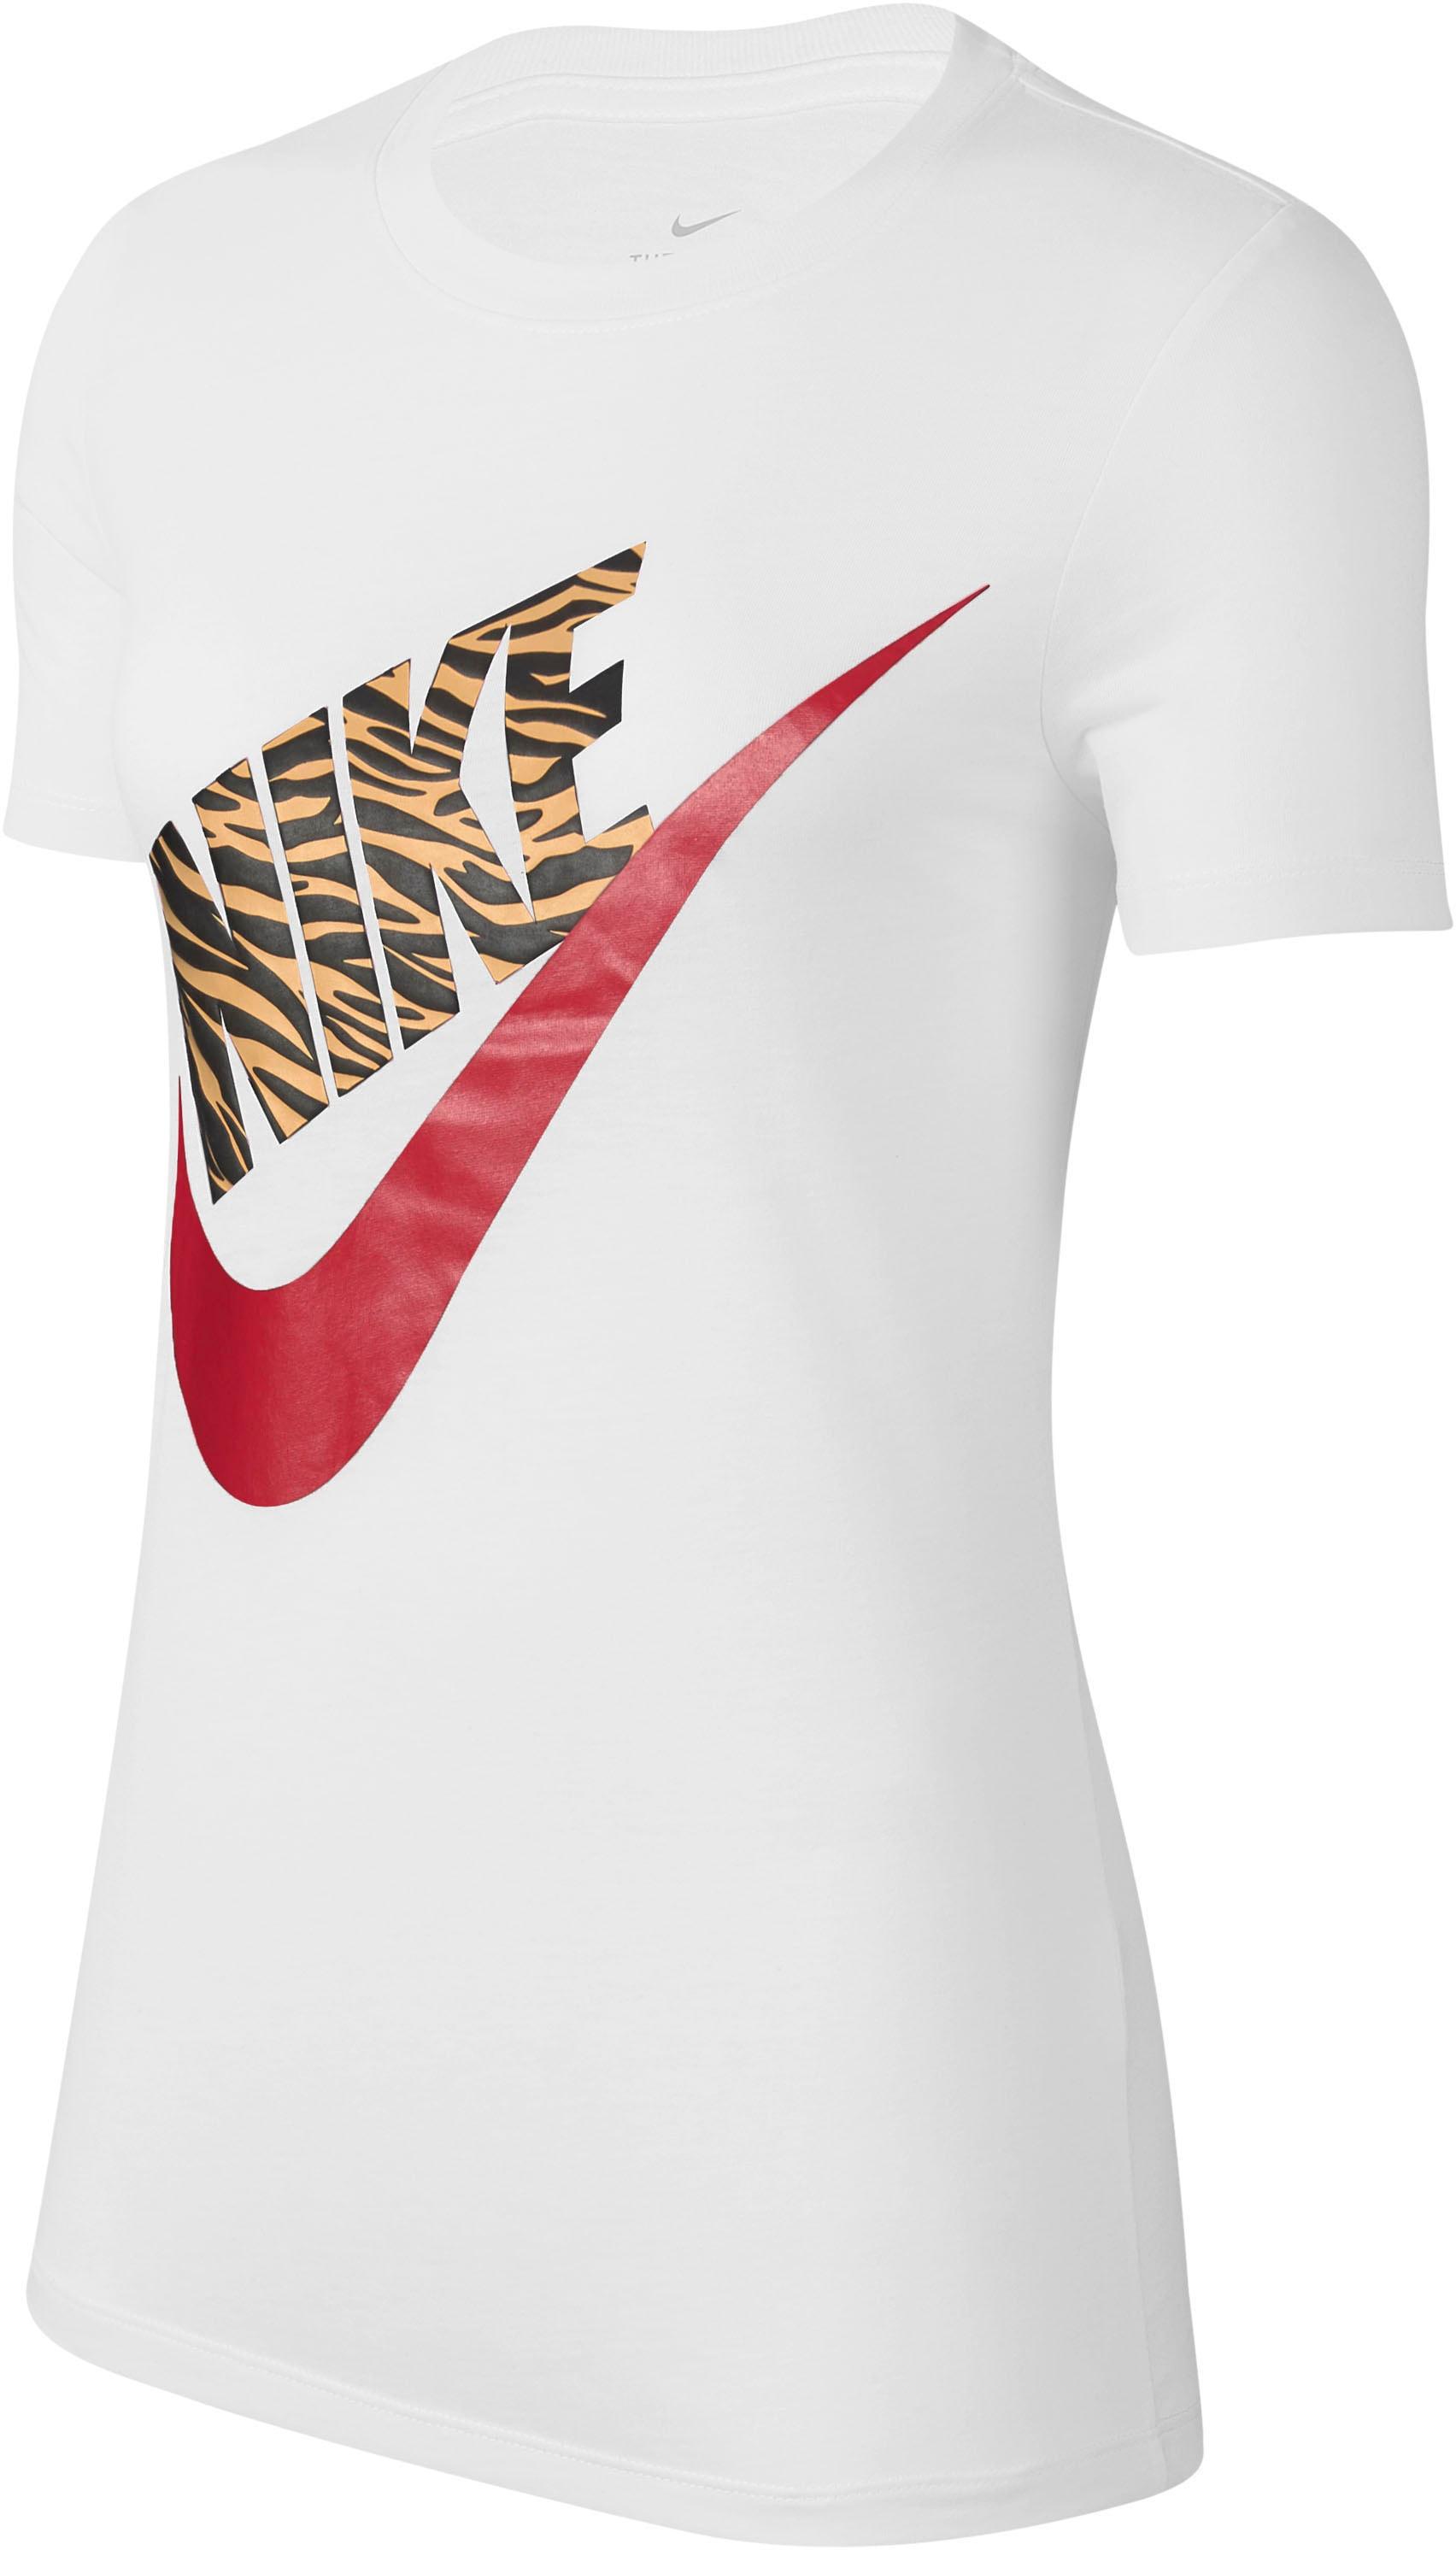 Nike Sportswear T-Shirt W NSW TEE PREP FUTURA 1 weiß Damen T-Shirts Shirts Sweatshirts